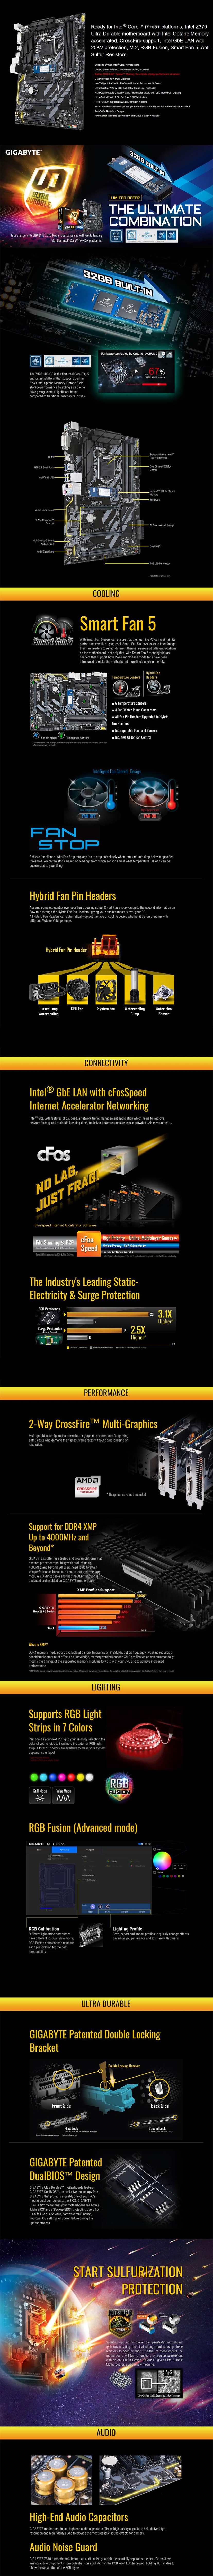 Gigabyte Z370 HD3-OP LGA 1151 ATX Motherboard